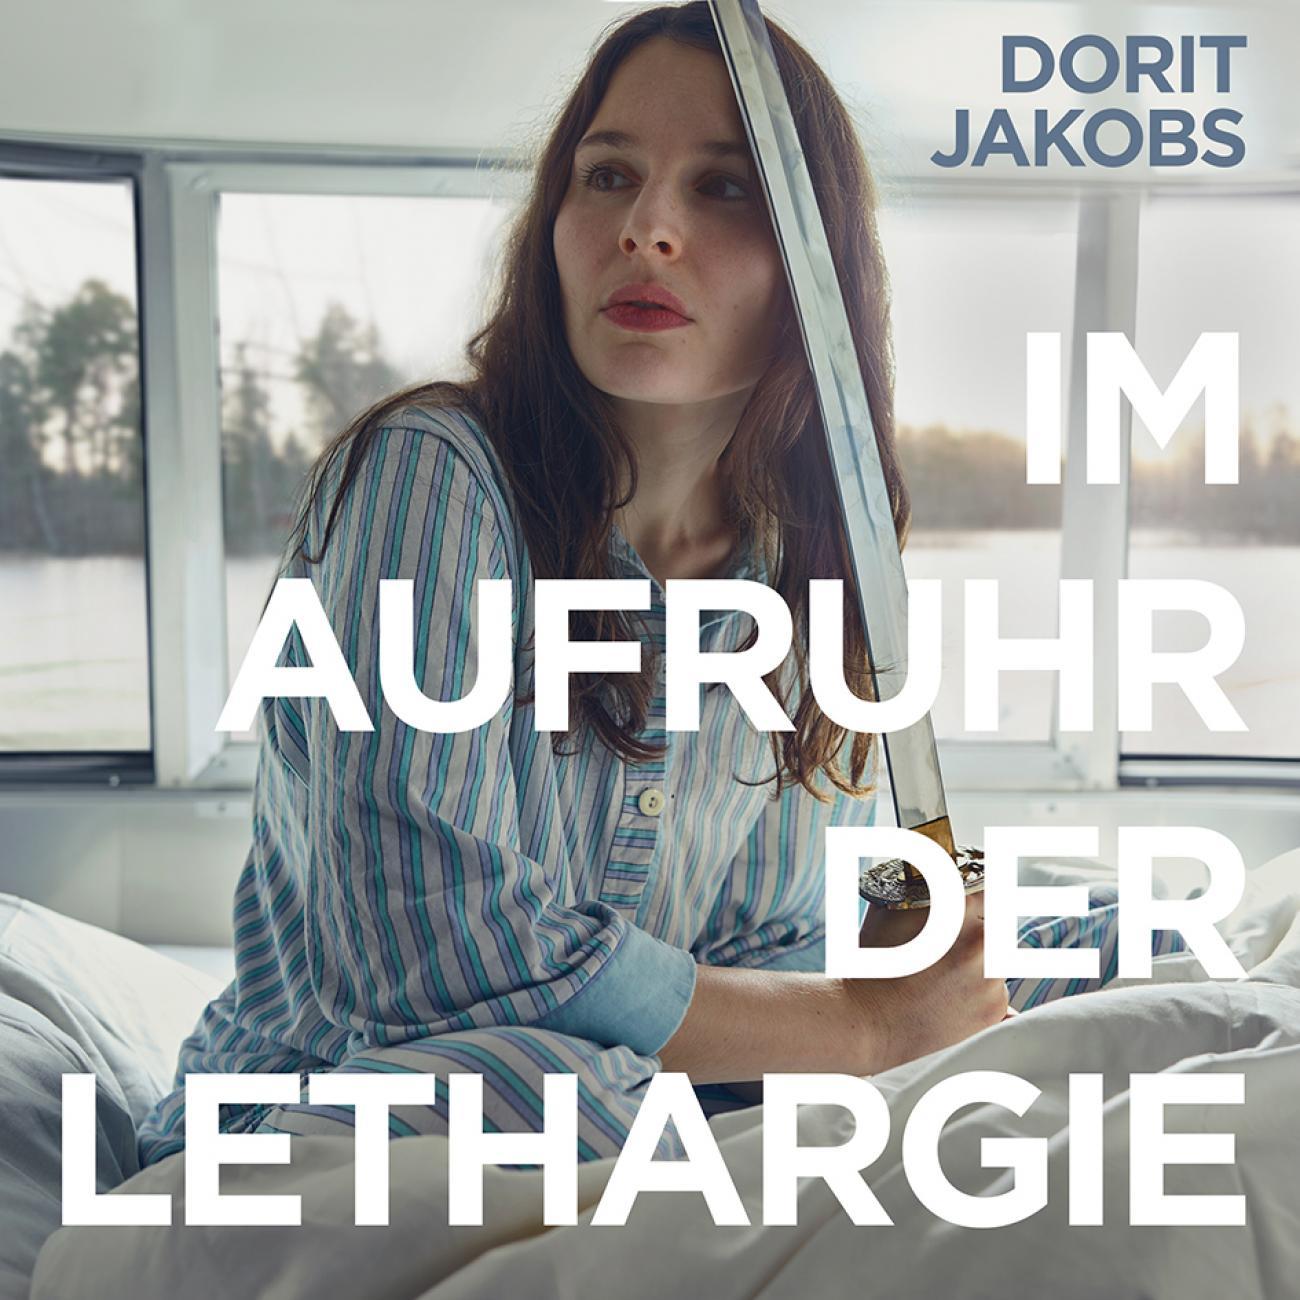 DoritJakobs_Cover